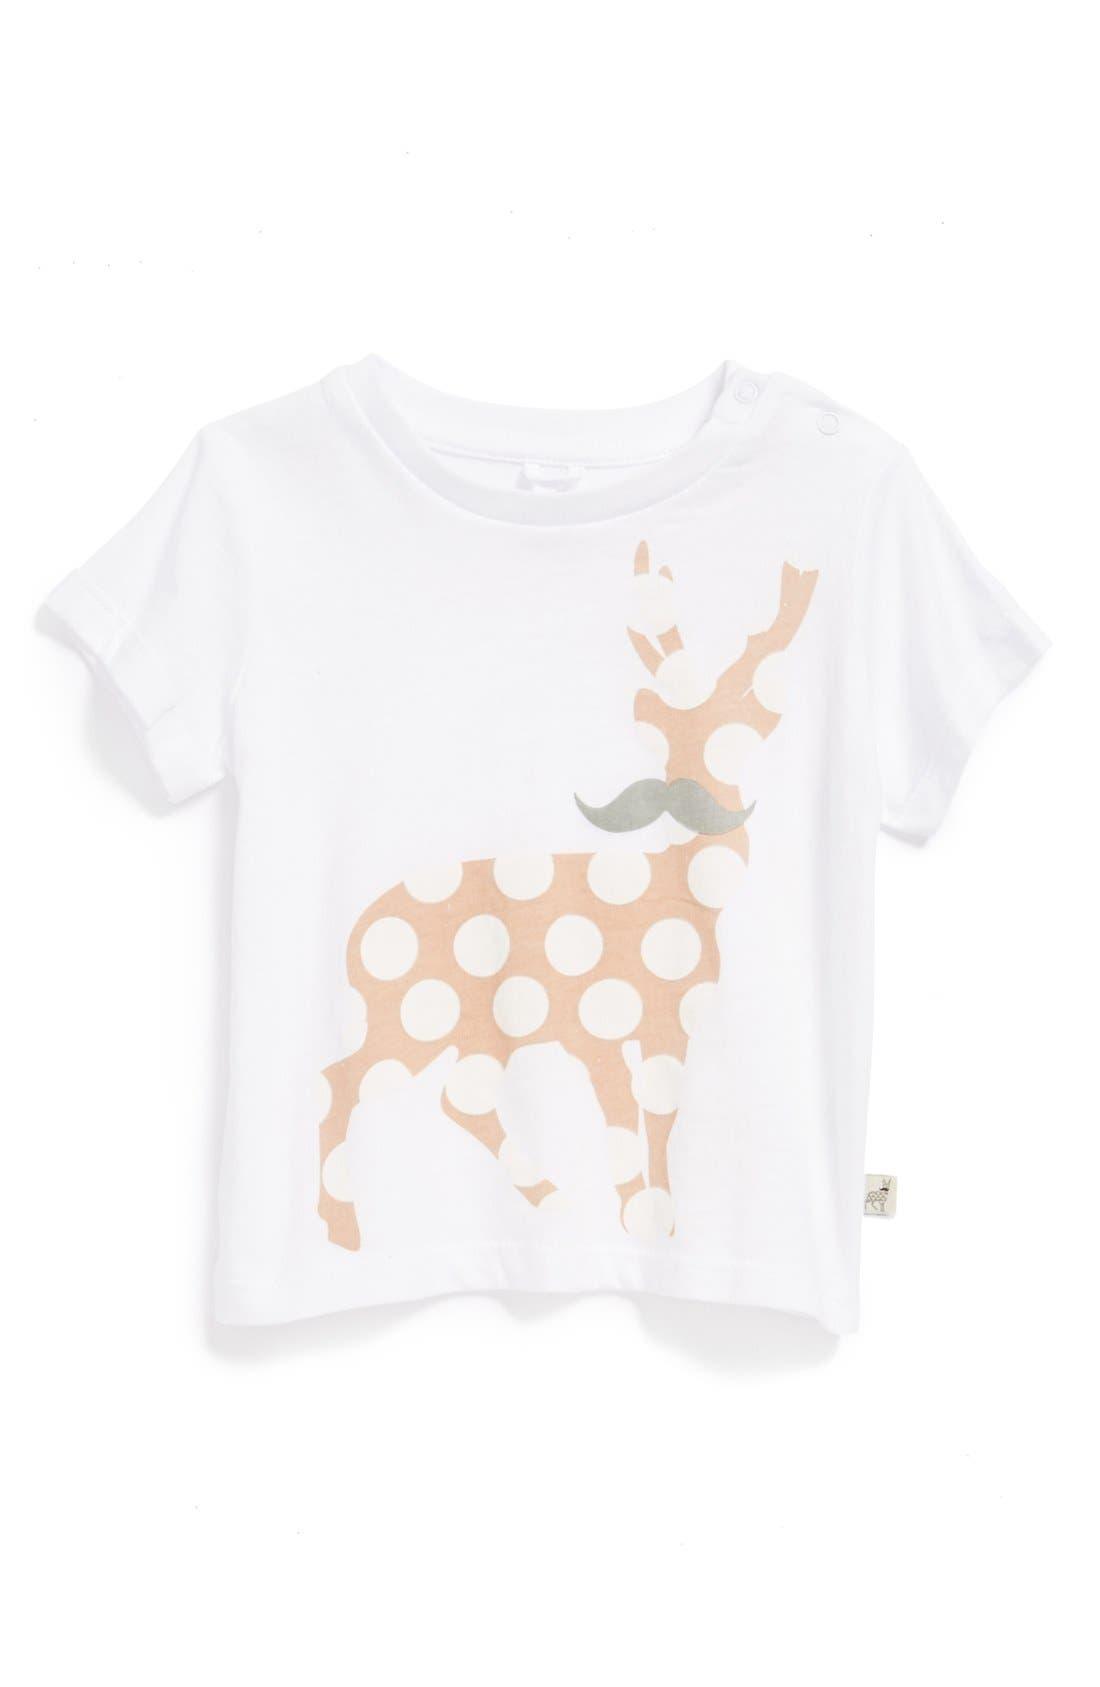 Alternate Image 1 Selected - Stella McCartney Kids 'Chuckle' T-Shirt (Baby Girls)